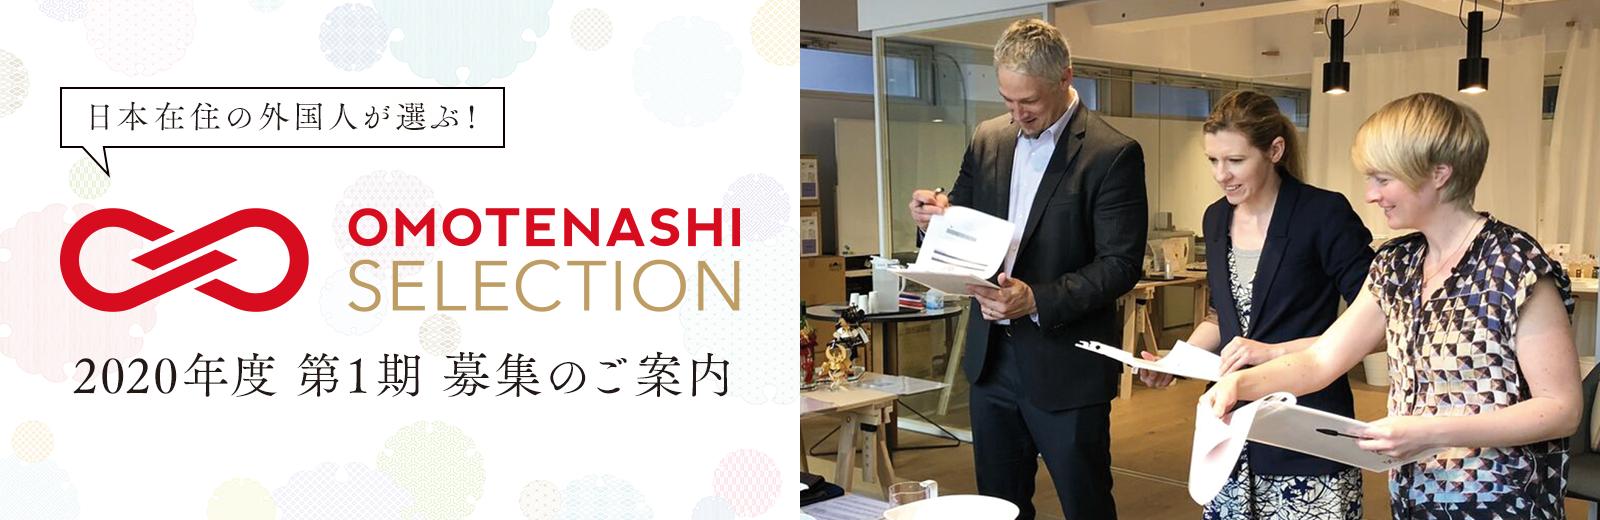 「OMOTENASHI Selection」6年目を迎える2020年度第1期の募集がスタート!